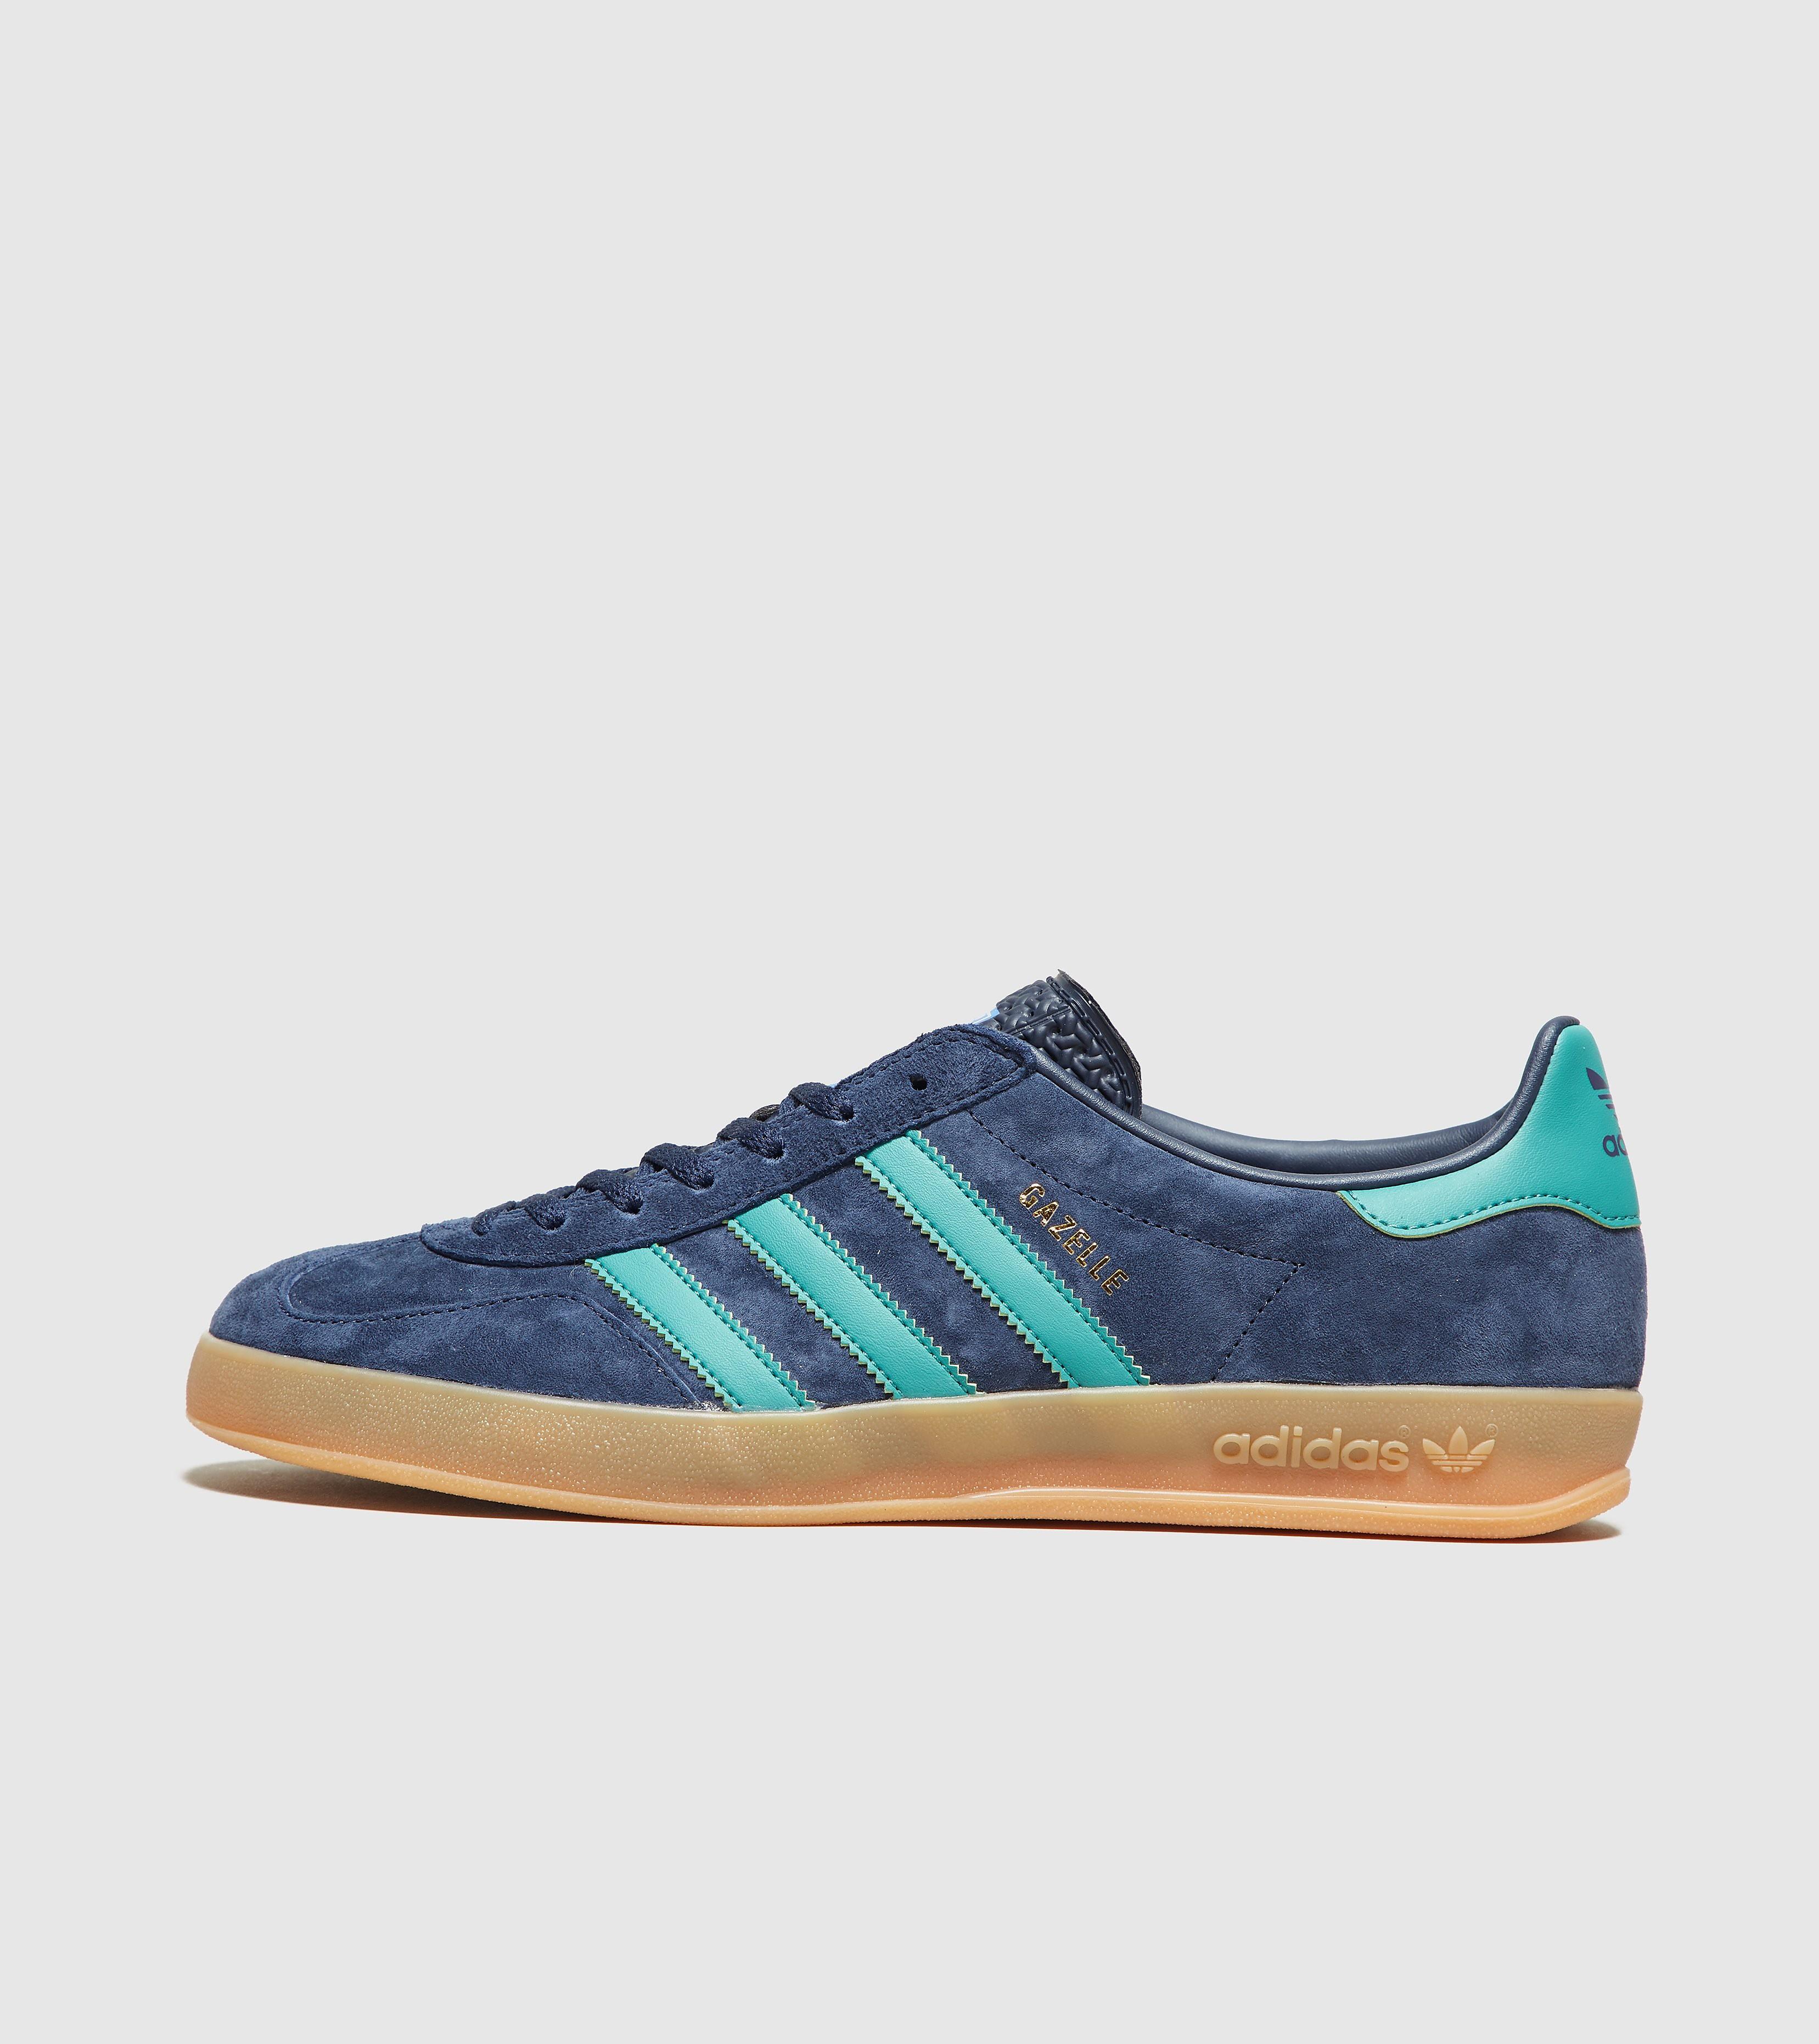 adidas Originals Gazelle Indoor (G27501)